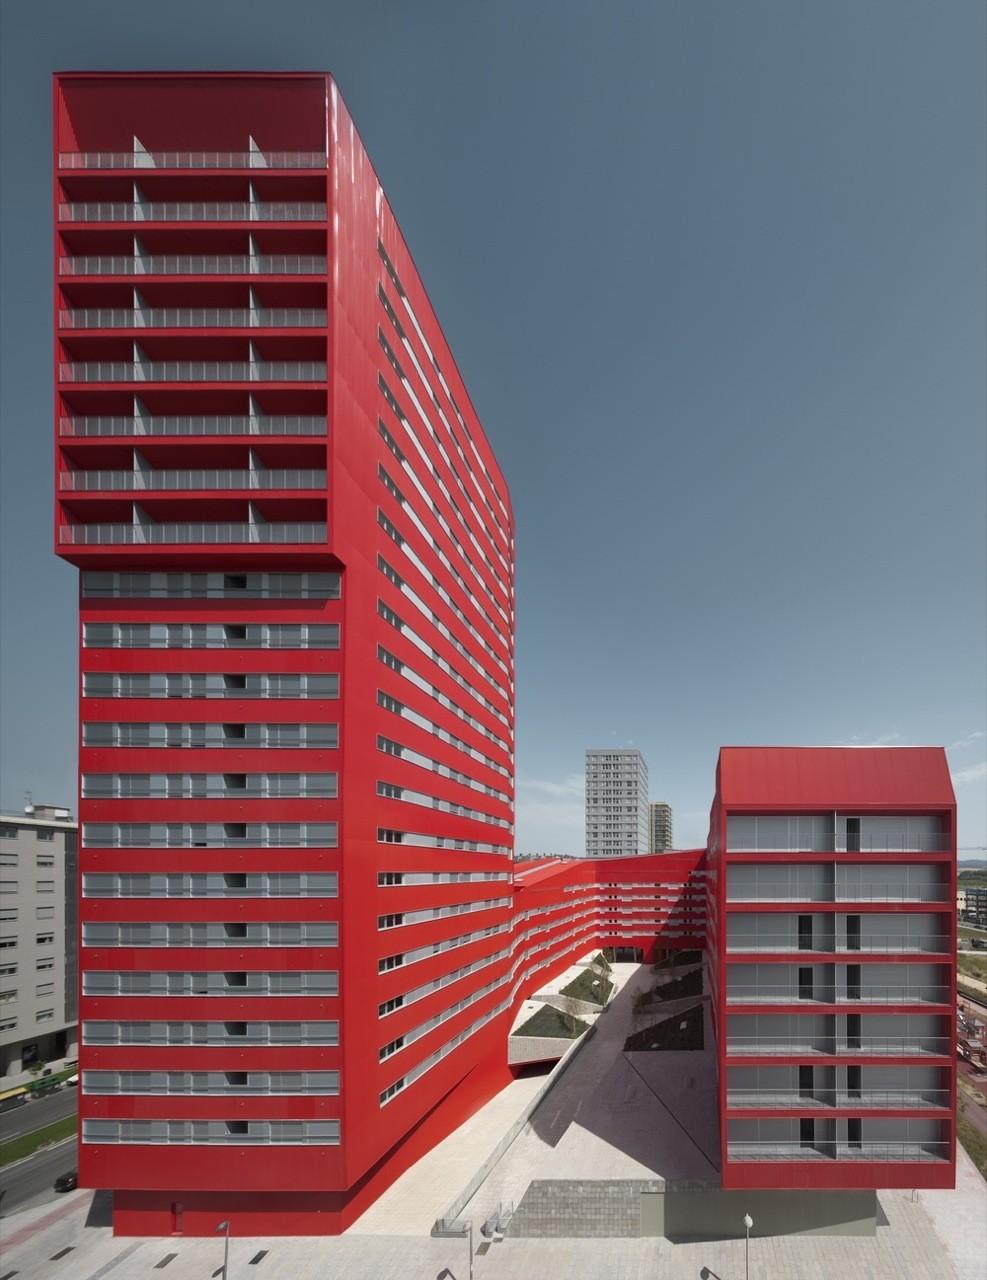 242 Social Housing Units in Salburúa / ACXT, © Aitor Ortiz